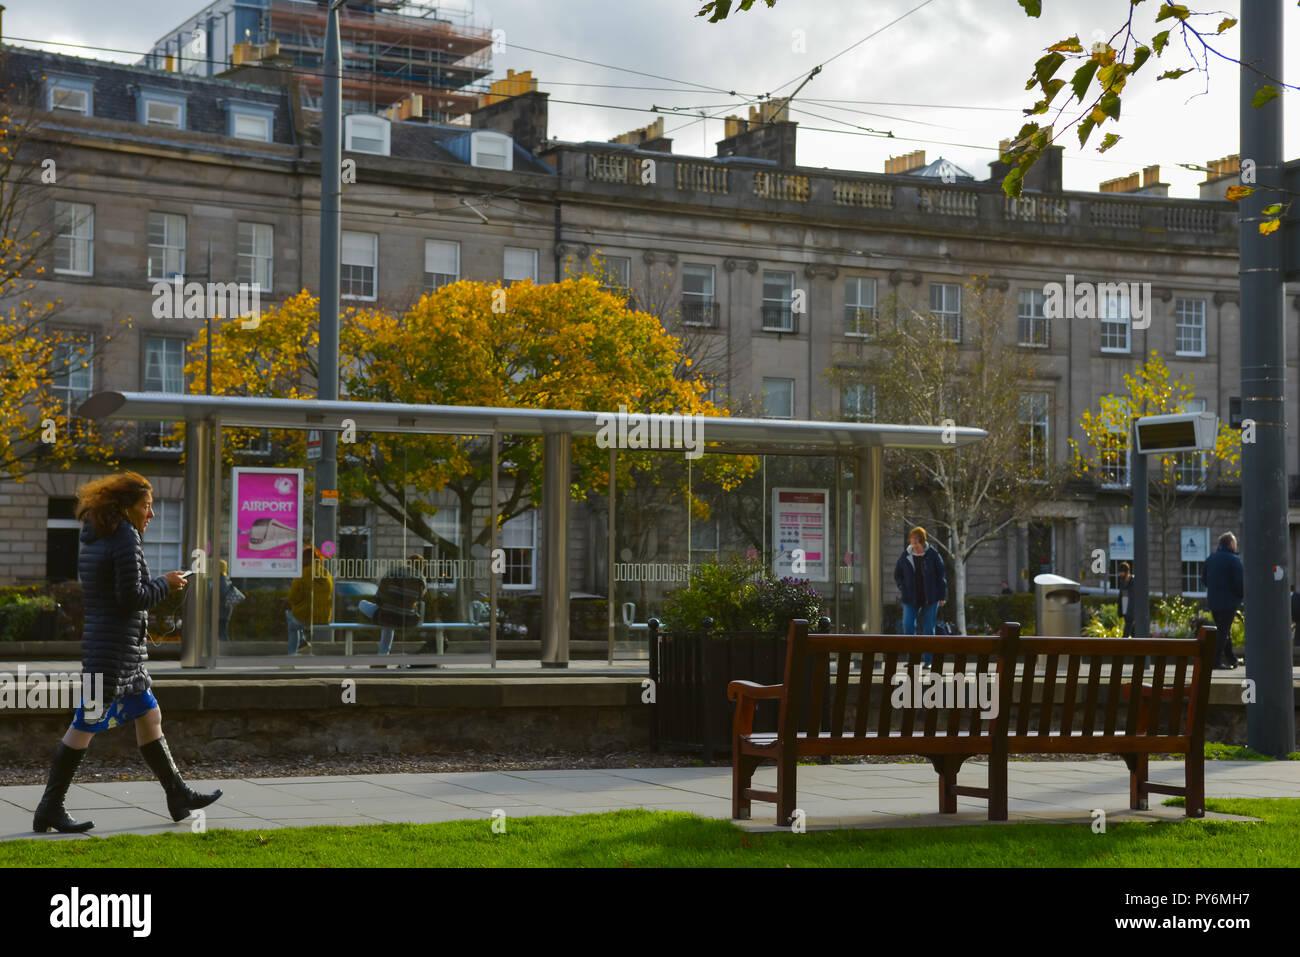 The city of Edinburgh Stock Photo